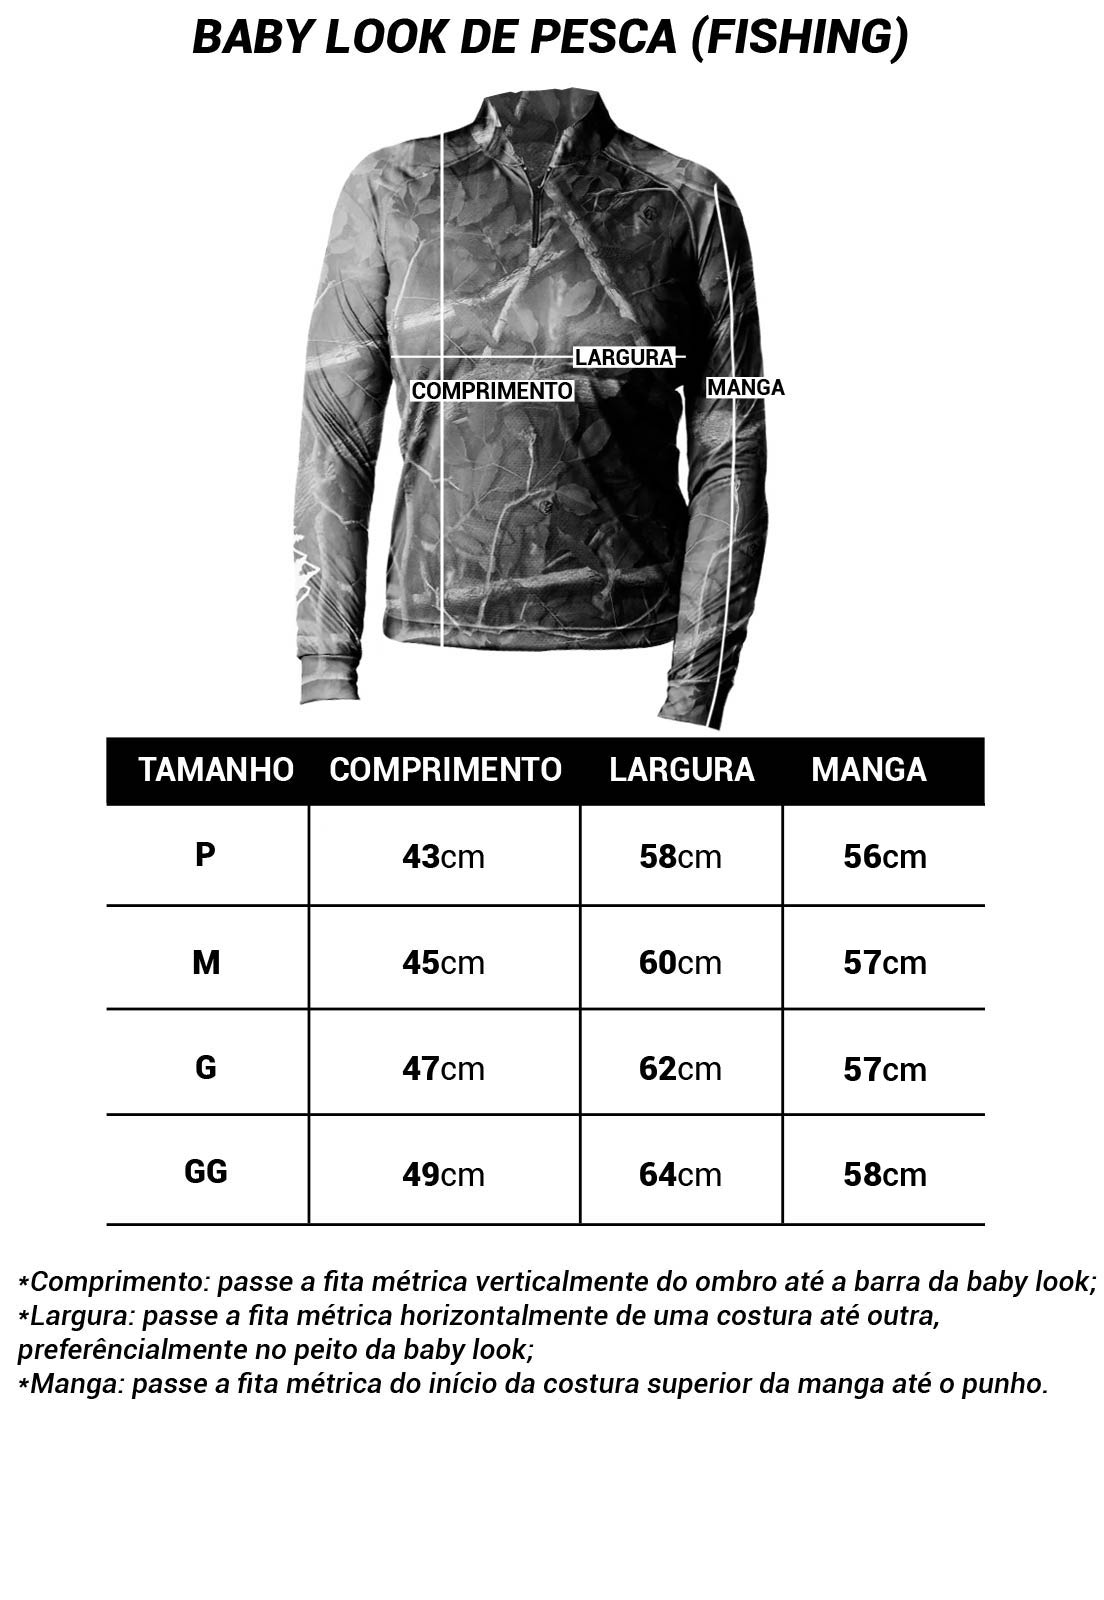 CAMISA DE PESCA FISH TECH PRO 31 FEMININA + BANDANA GRÁTIS  - Real Hunter